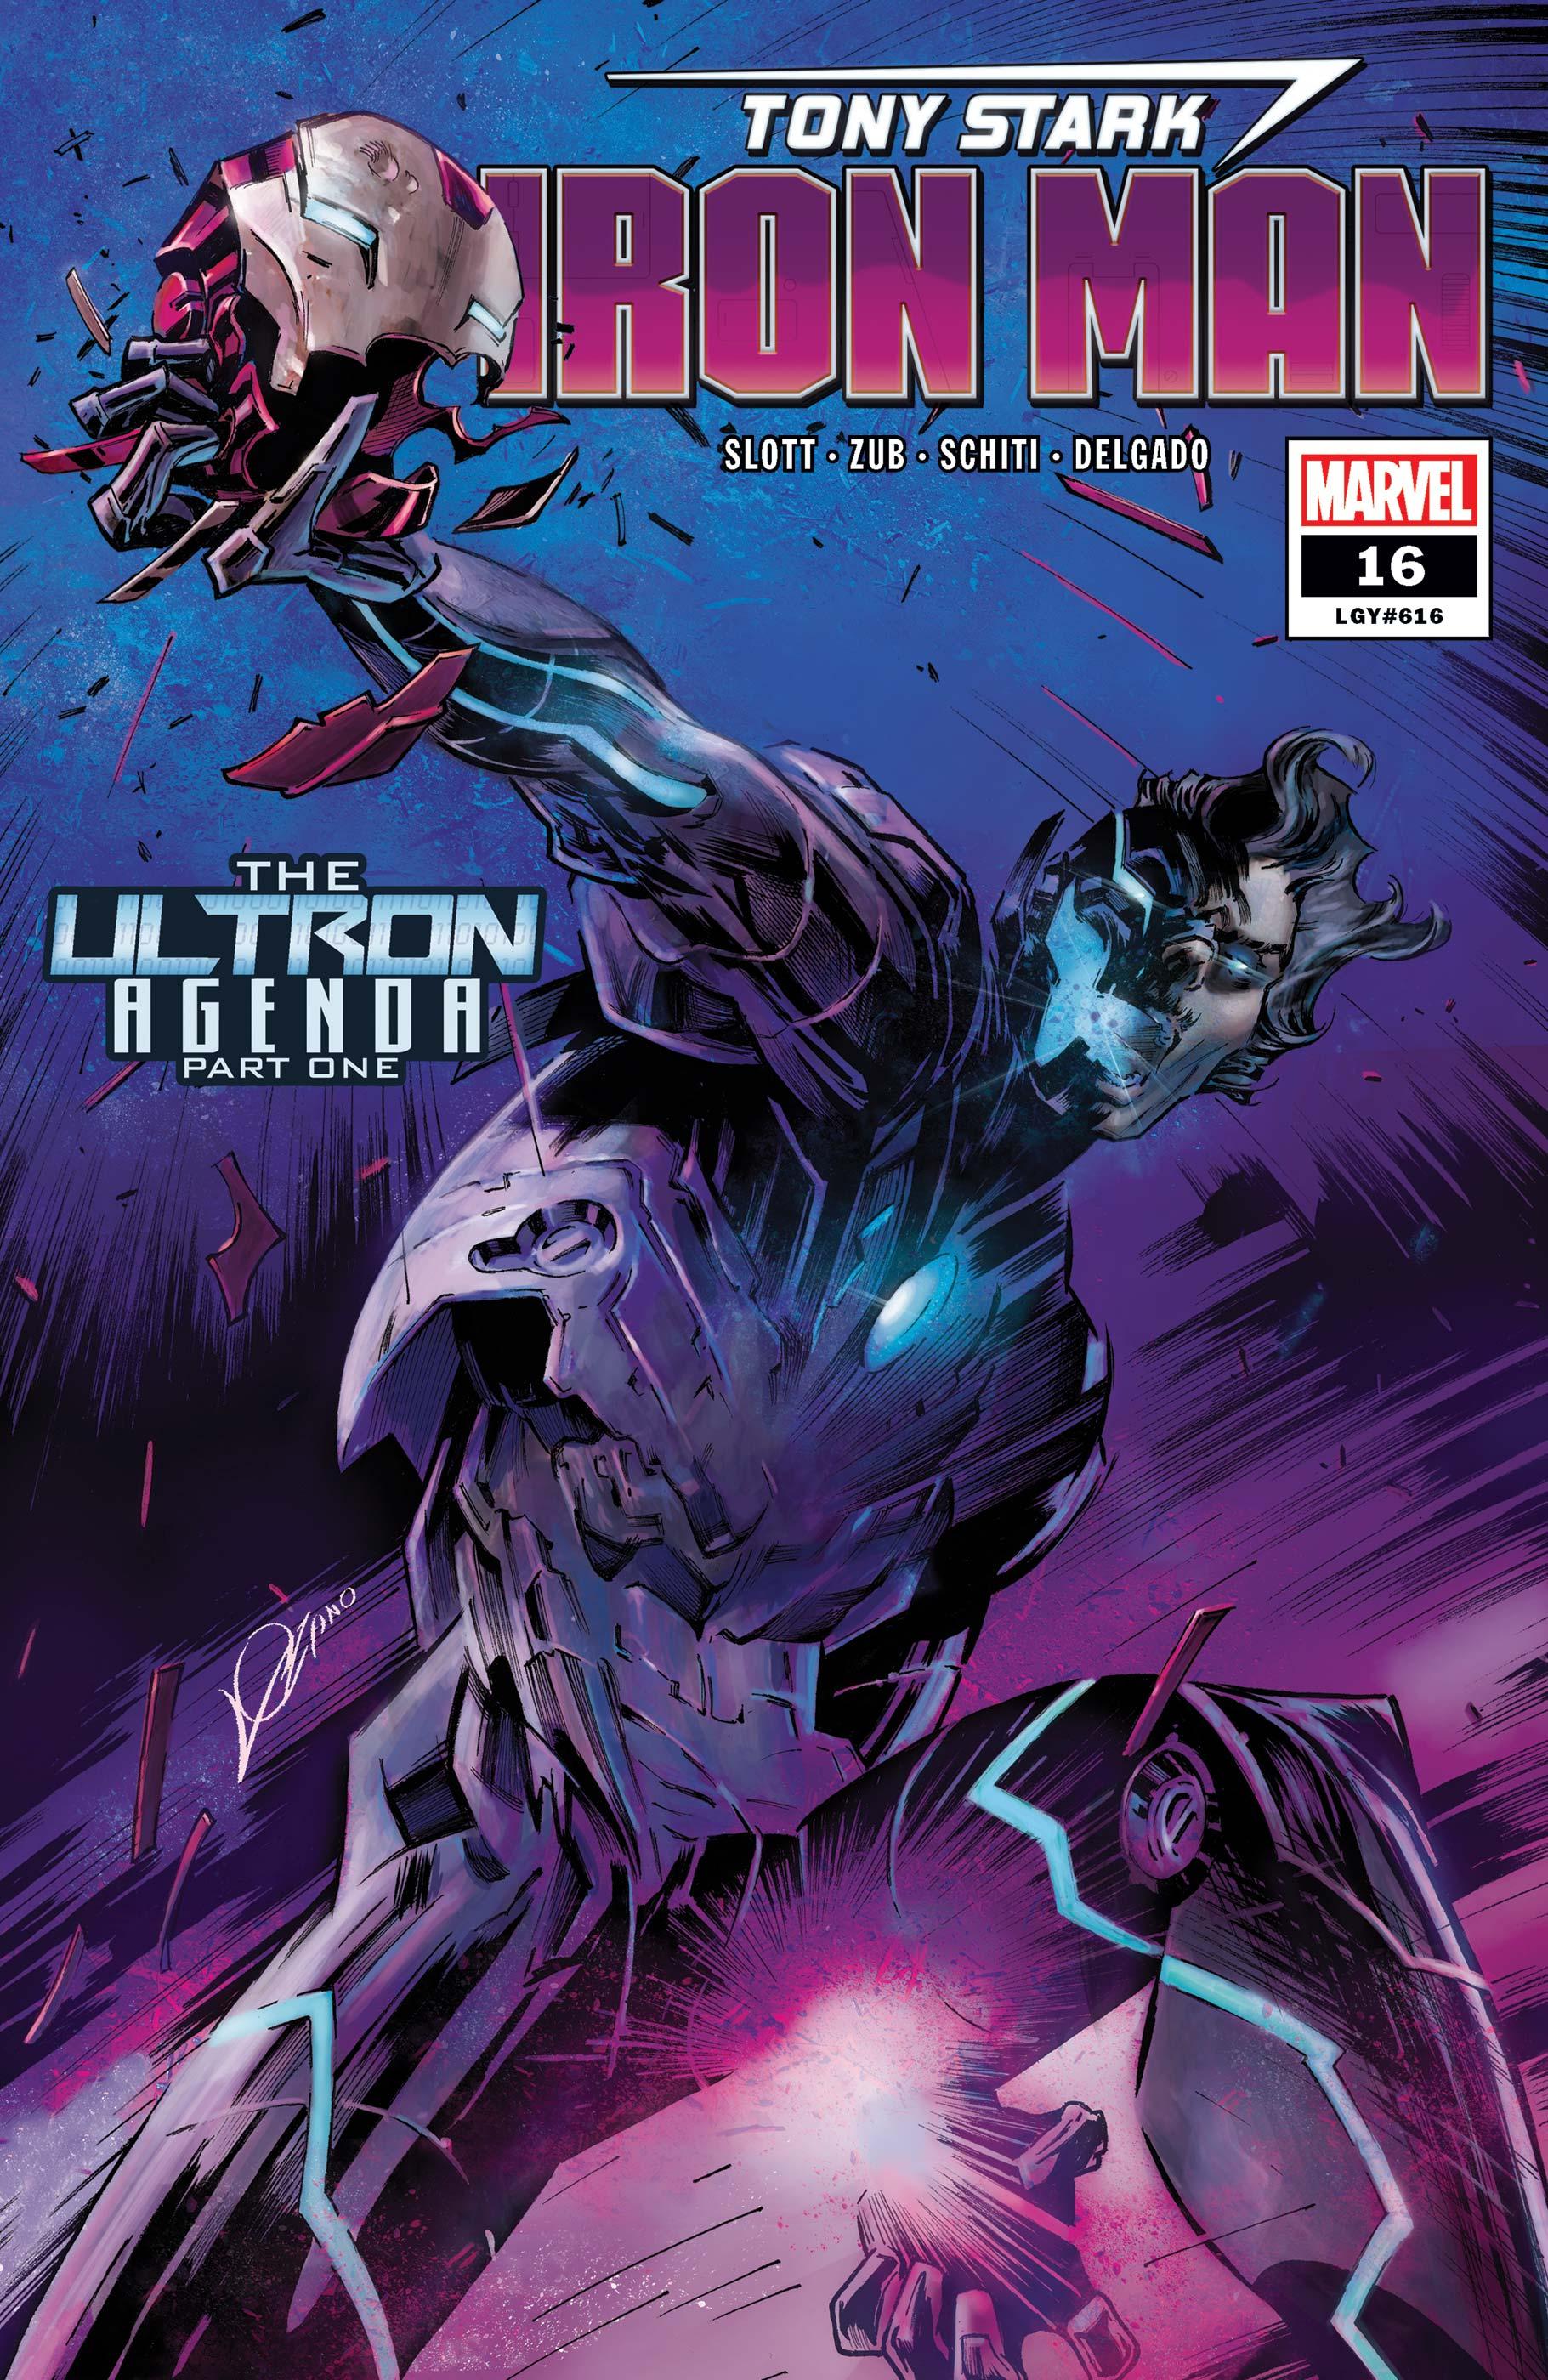 Tony Stark: Iron Man (2018) #16